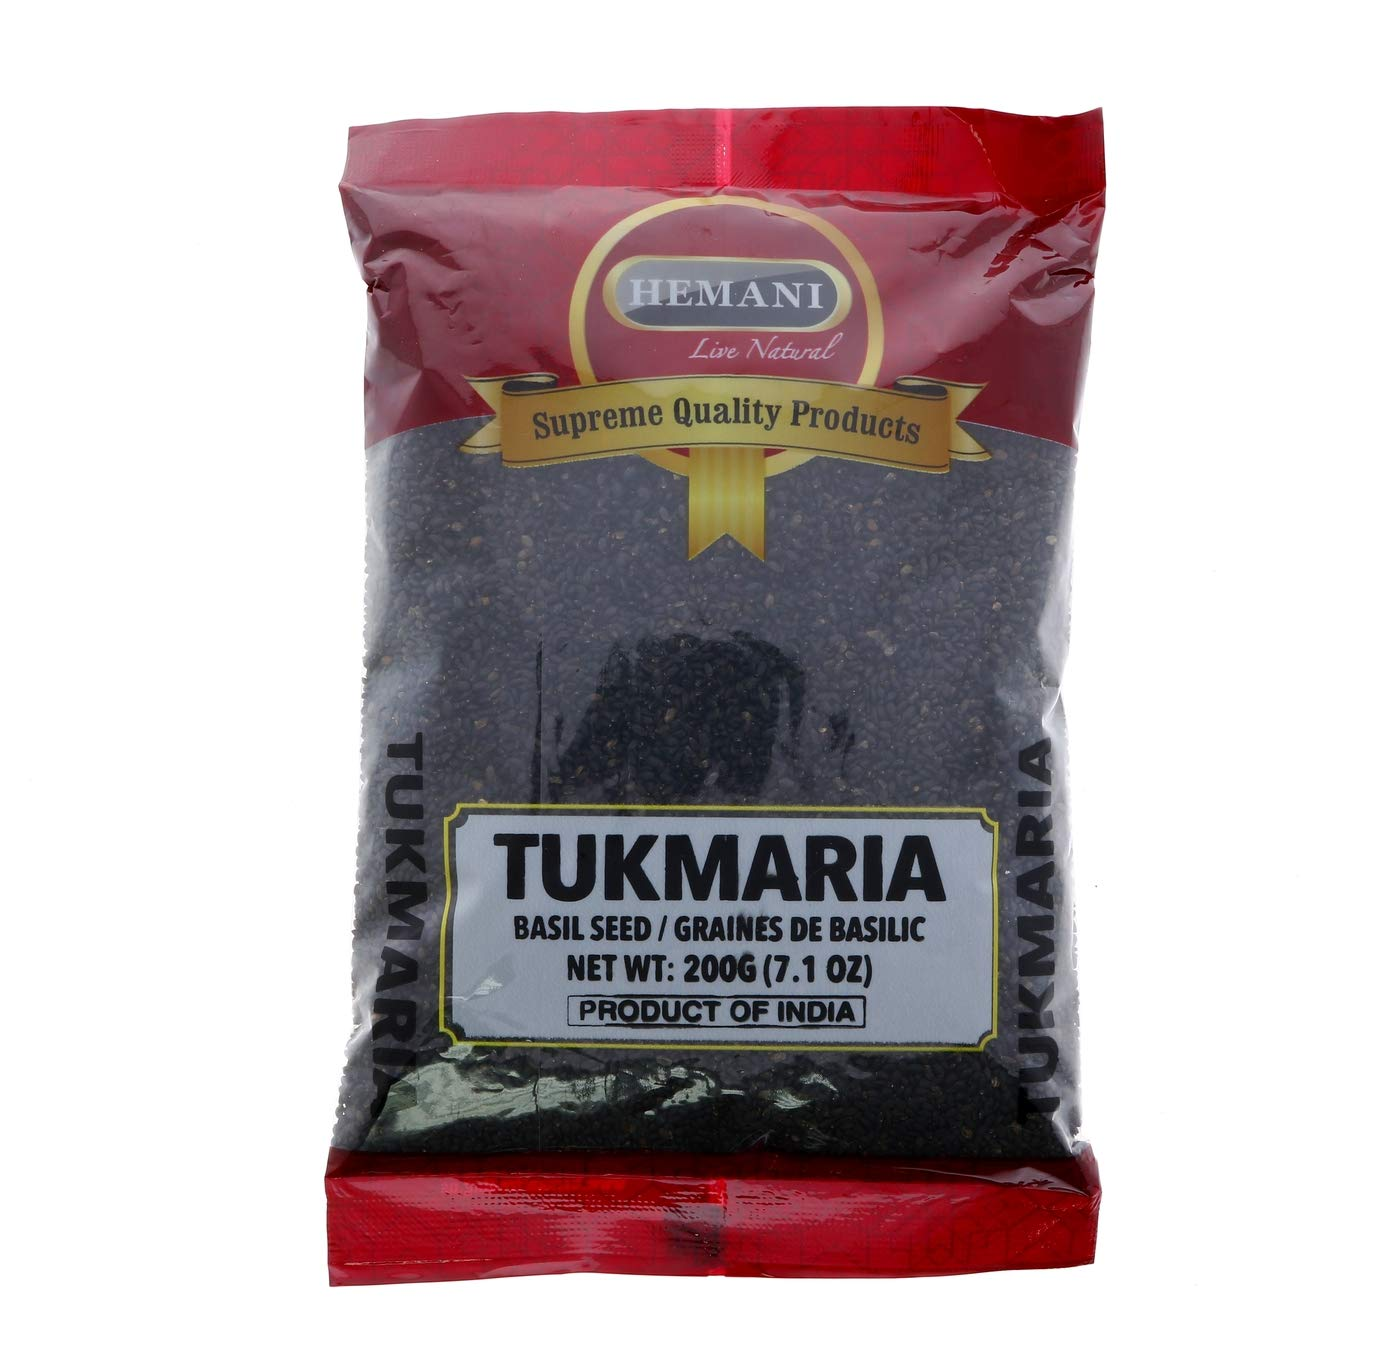 HEMANI | Edible Basil Seeds 7.1 OZ (200g) | Tukmaria | Thai Basil Seeds - 2X more Nutritious than Chia Seeds